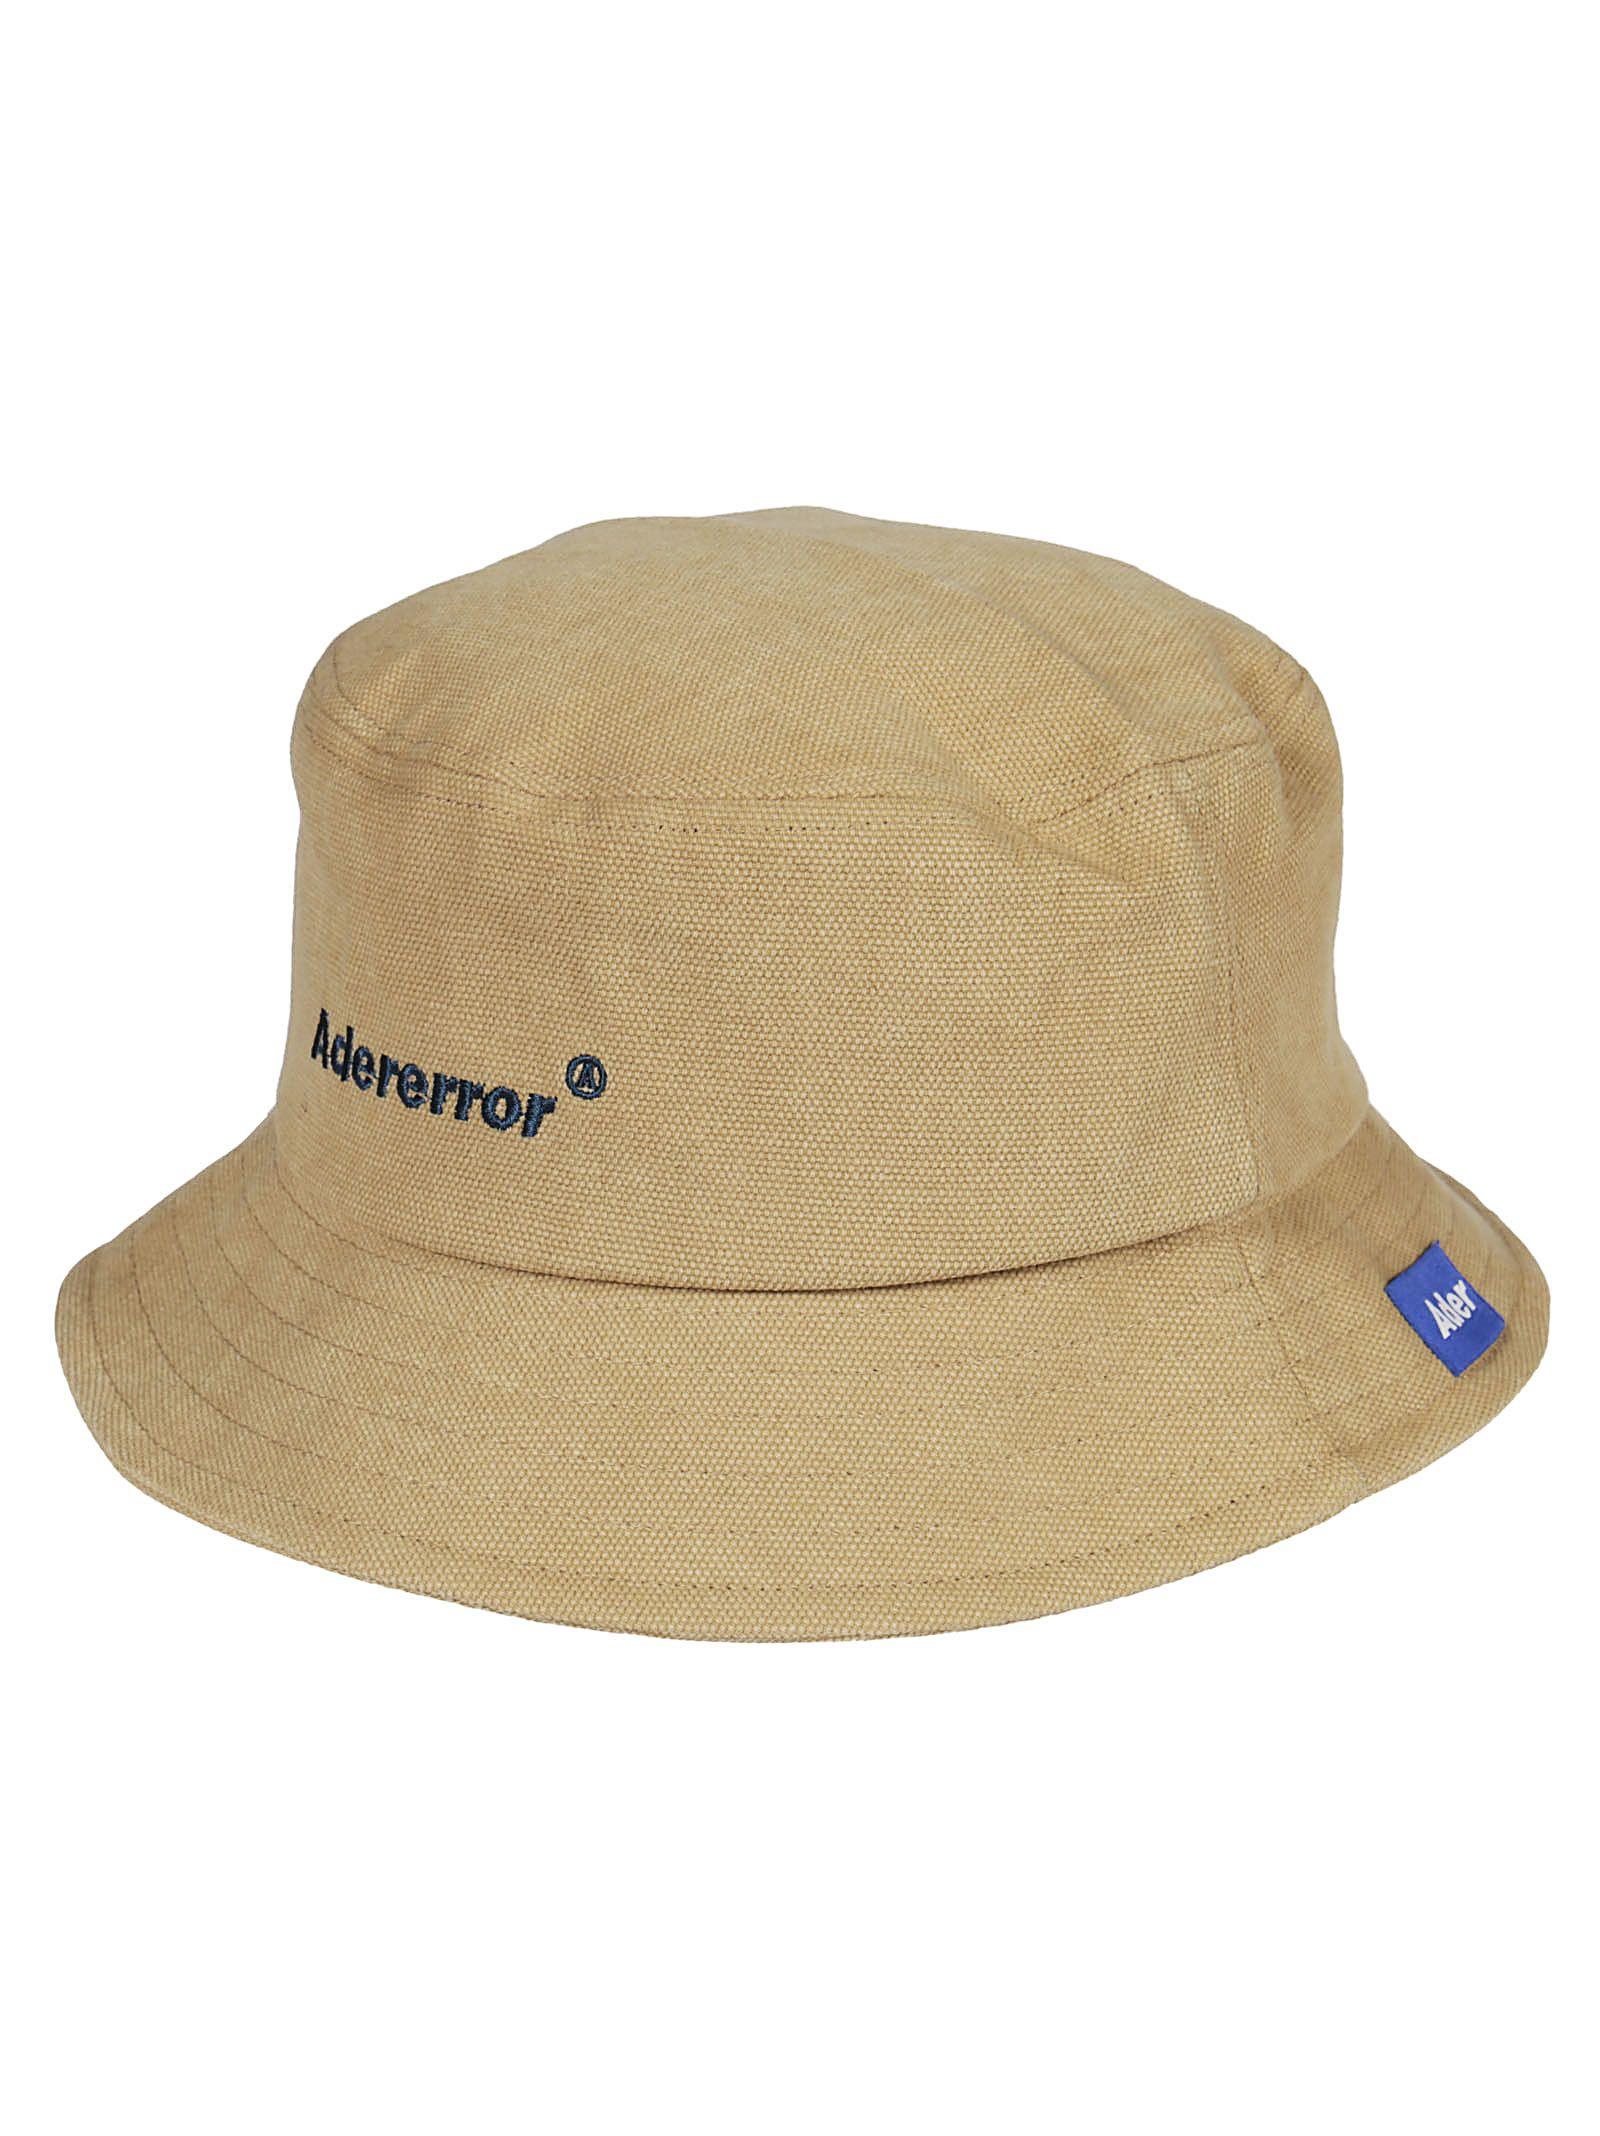 Ader Error EMBROIDERED LOGO HAT